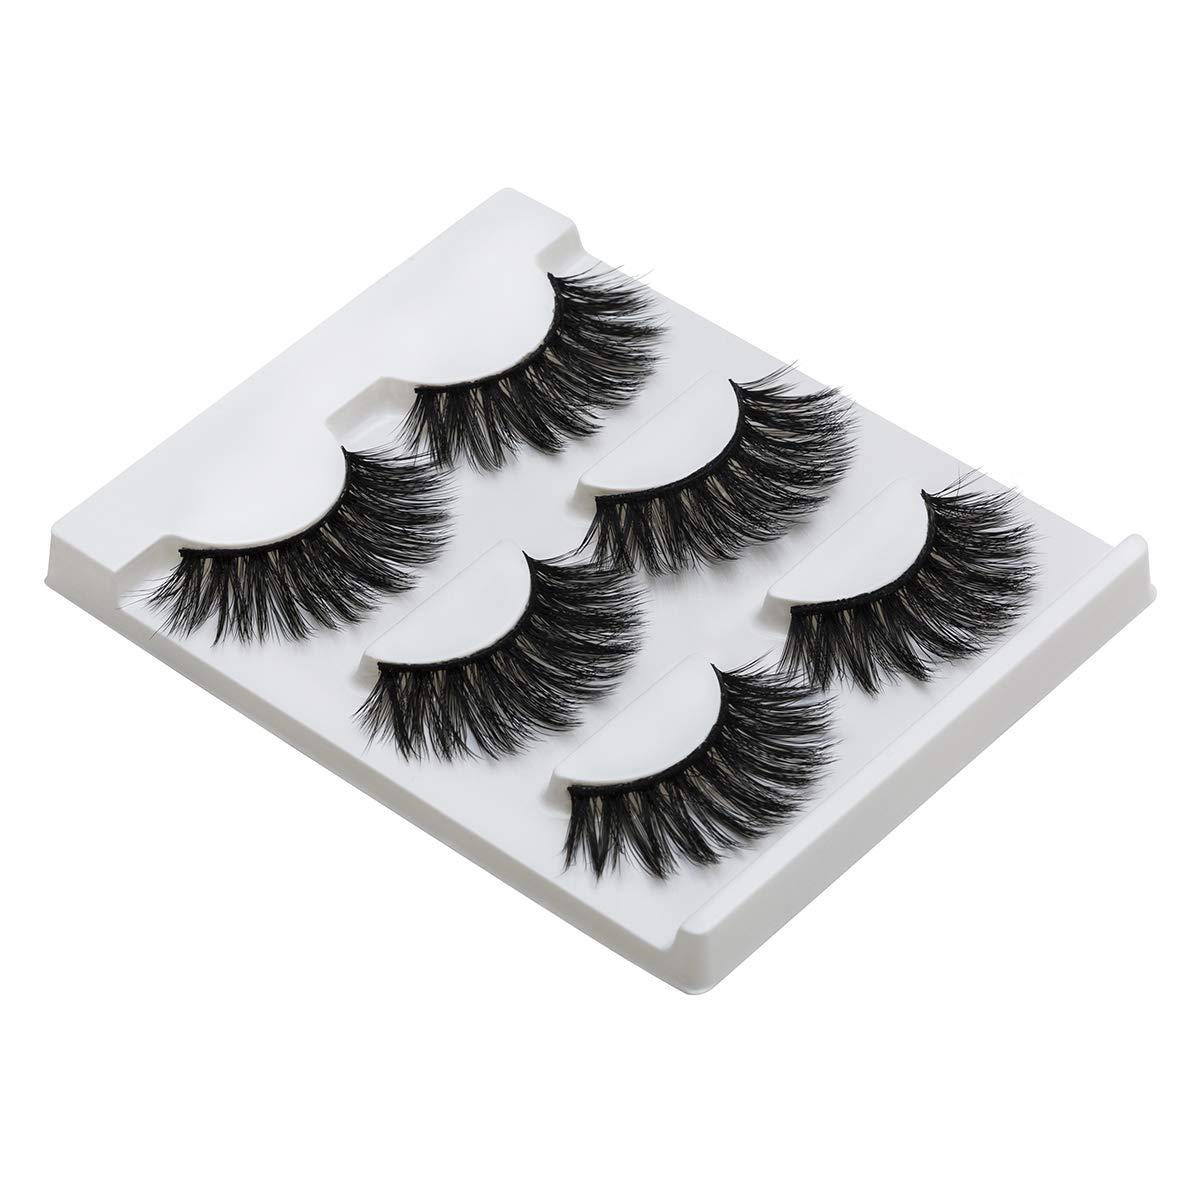 DYSILK 3D Eyelashes Dramatic Look False Eyelashes Extension Makeup Long Handmade Fake Eyelashes Fluffy Soft Reusable Black 3 Pairs